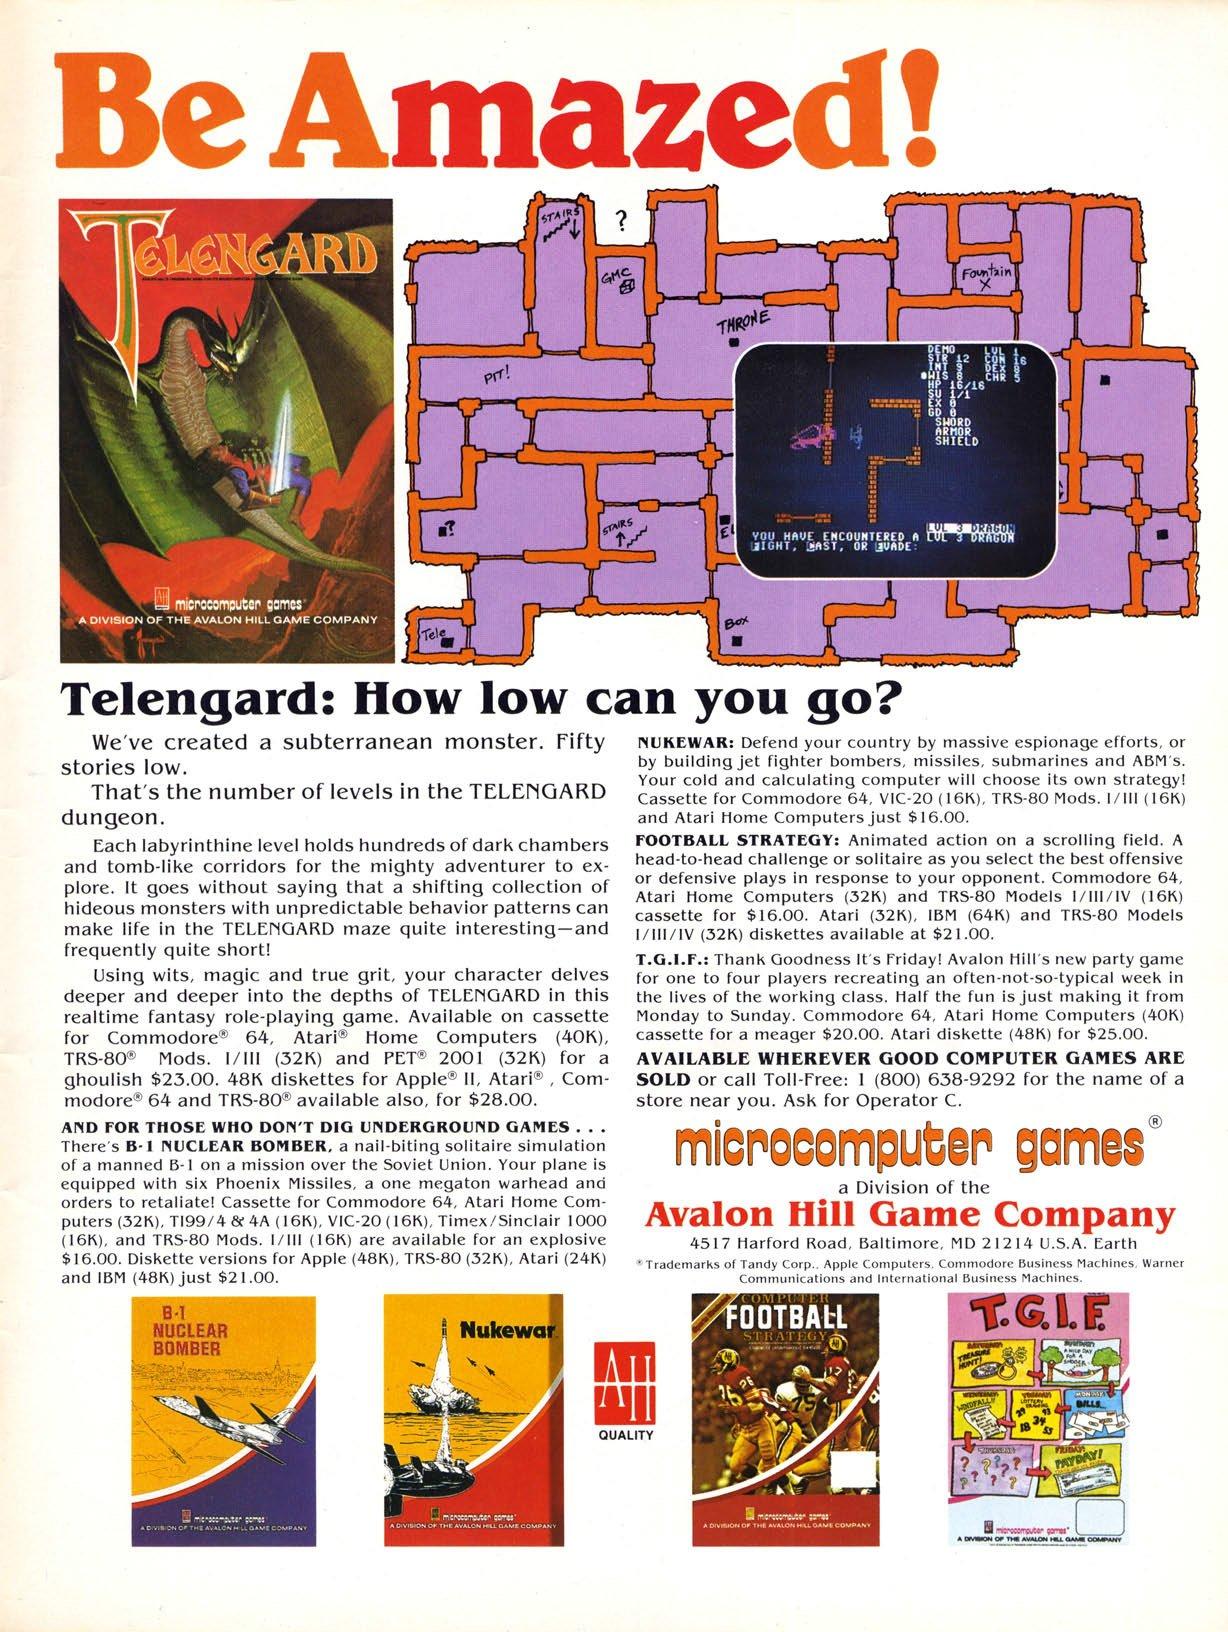 Telengard, B1 Nuclear Bomber, Nukewar, Football Strategy, T.G.I.F.